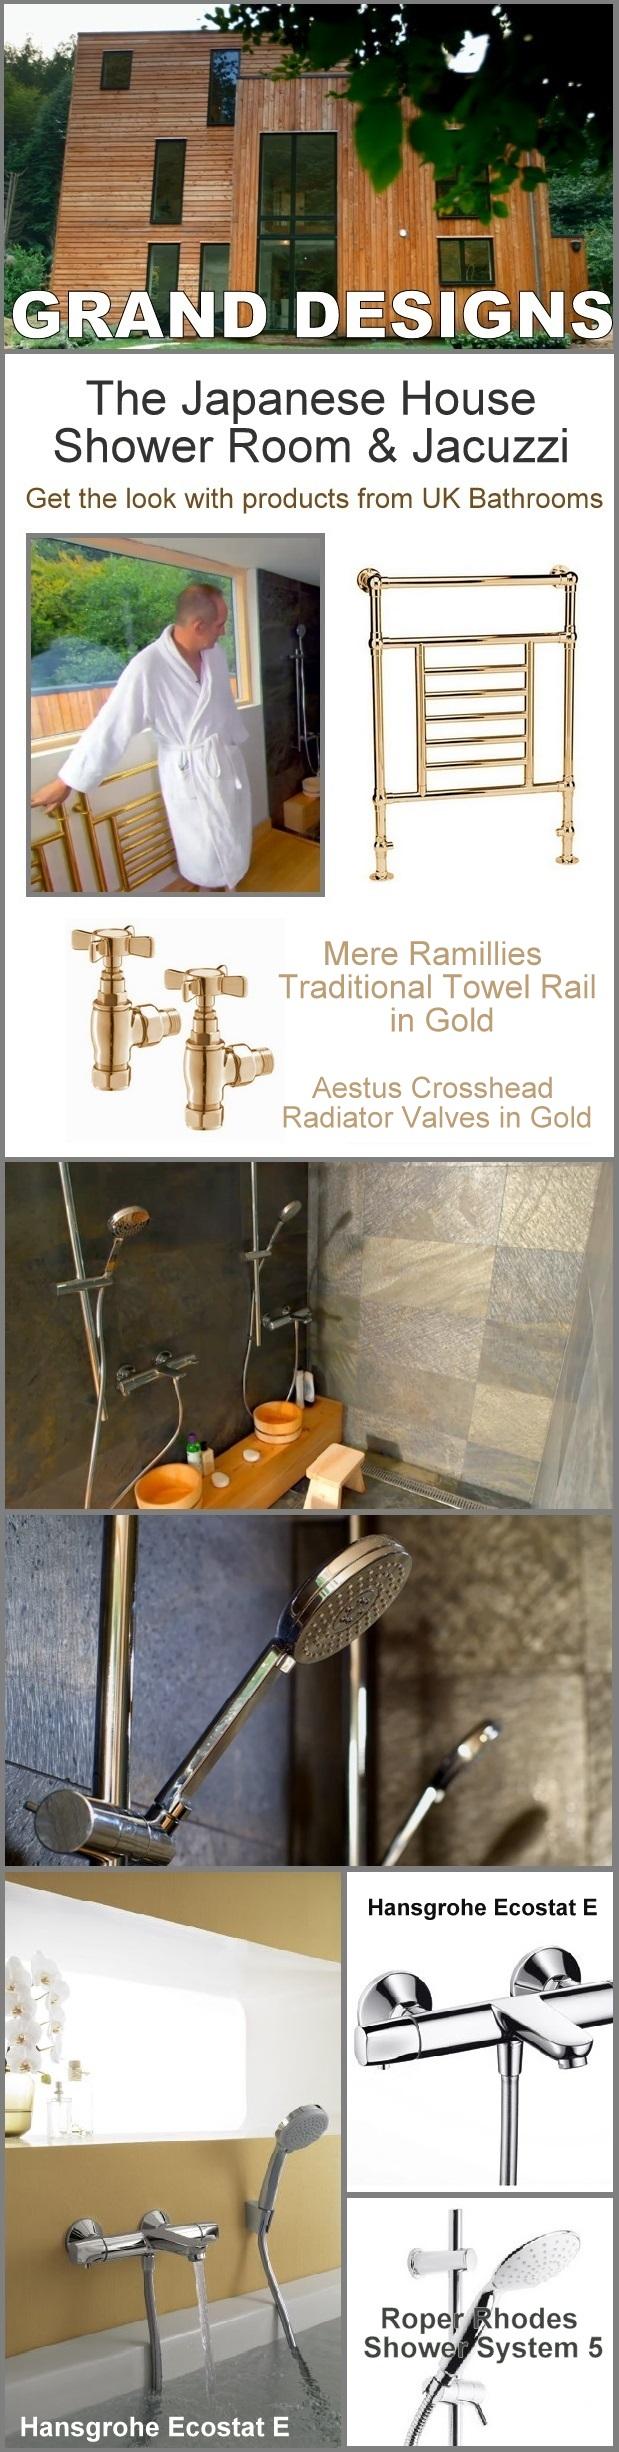 Grand Designs Japanese Shower Room